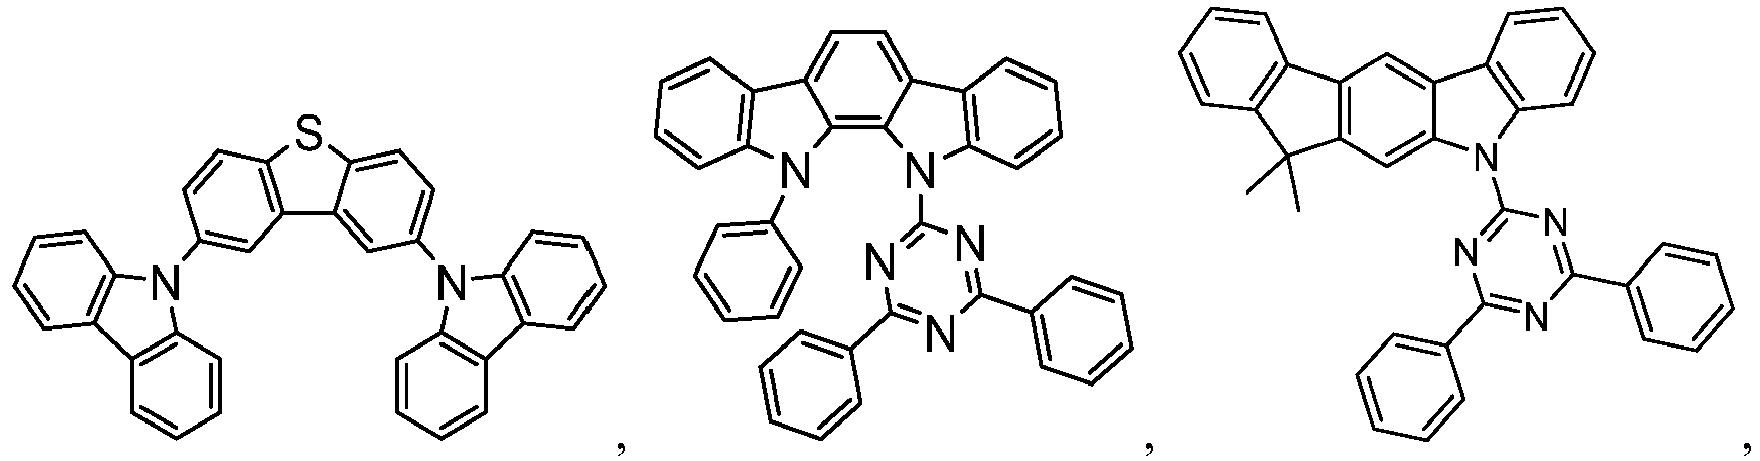 Figure imgb0981